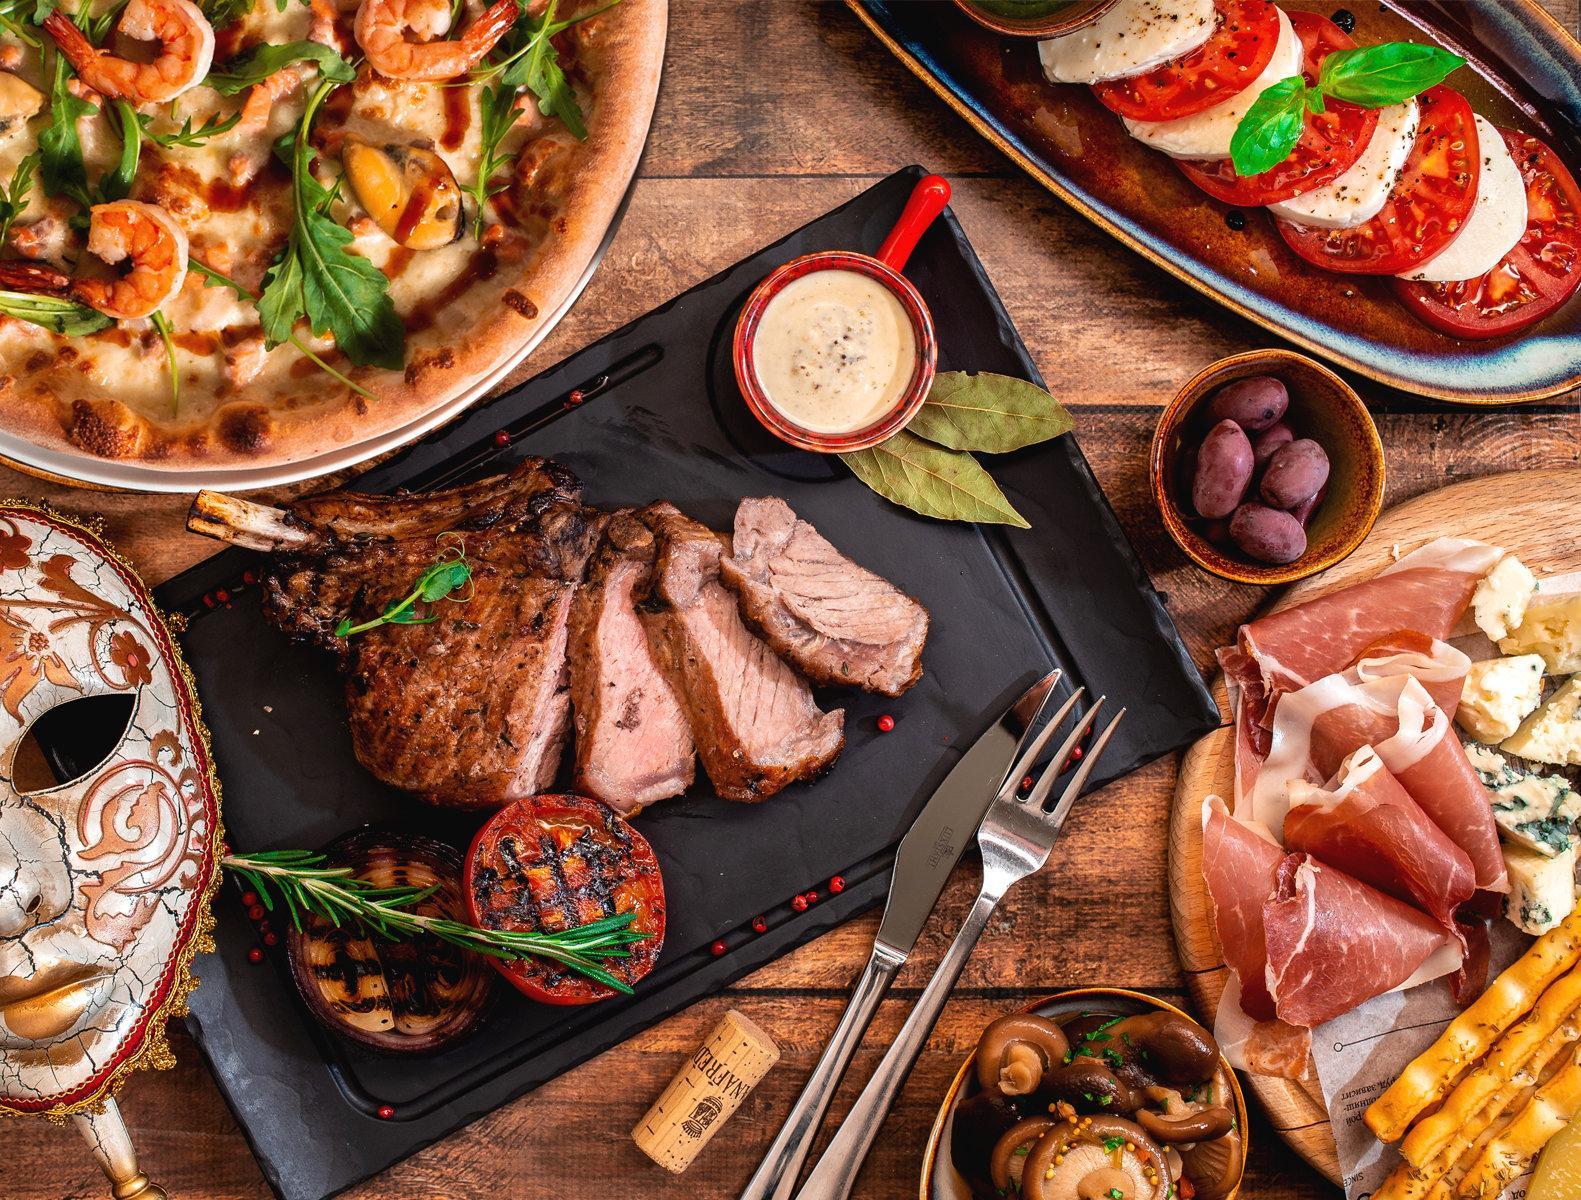 фотография Ресторана-пиццерии Di ПАОЛО в ТЦ Матвеевский